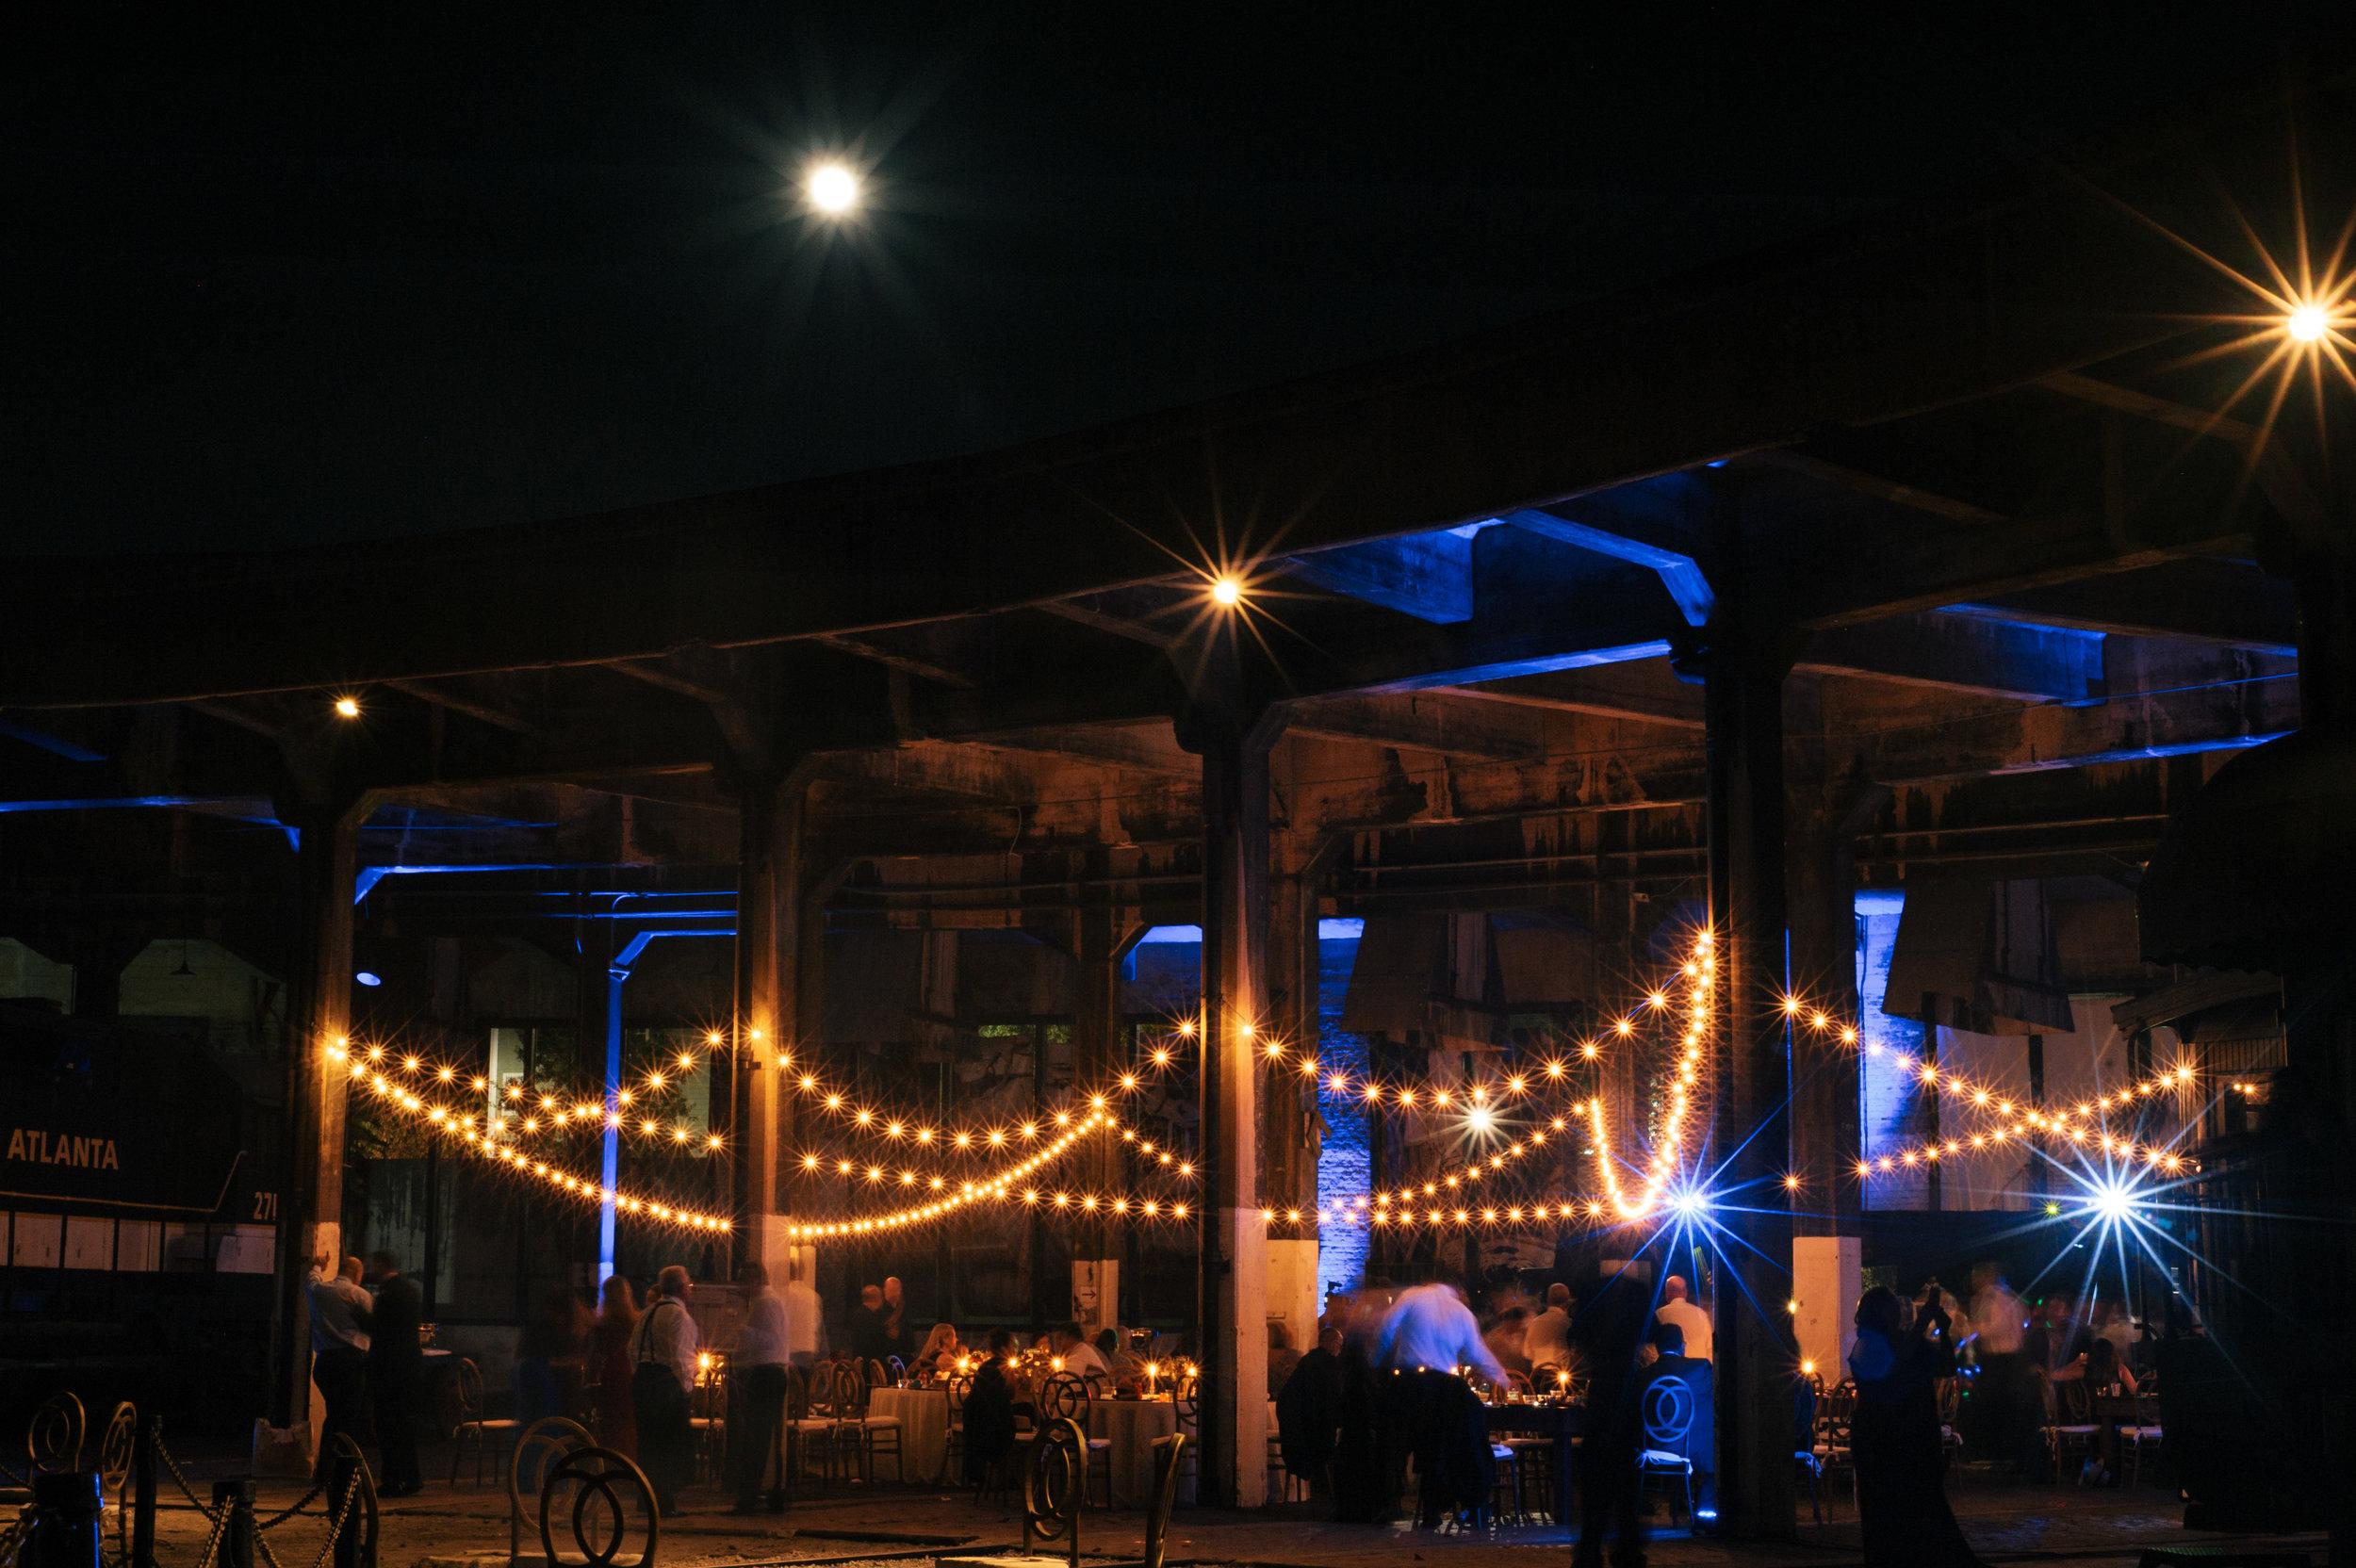 Iggy-and-yesenia-savannah-railroad-museum-wedding-meg-hill-photo- (786 of 866).jpg